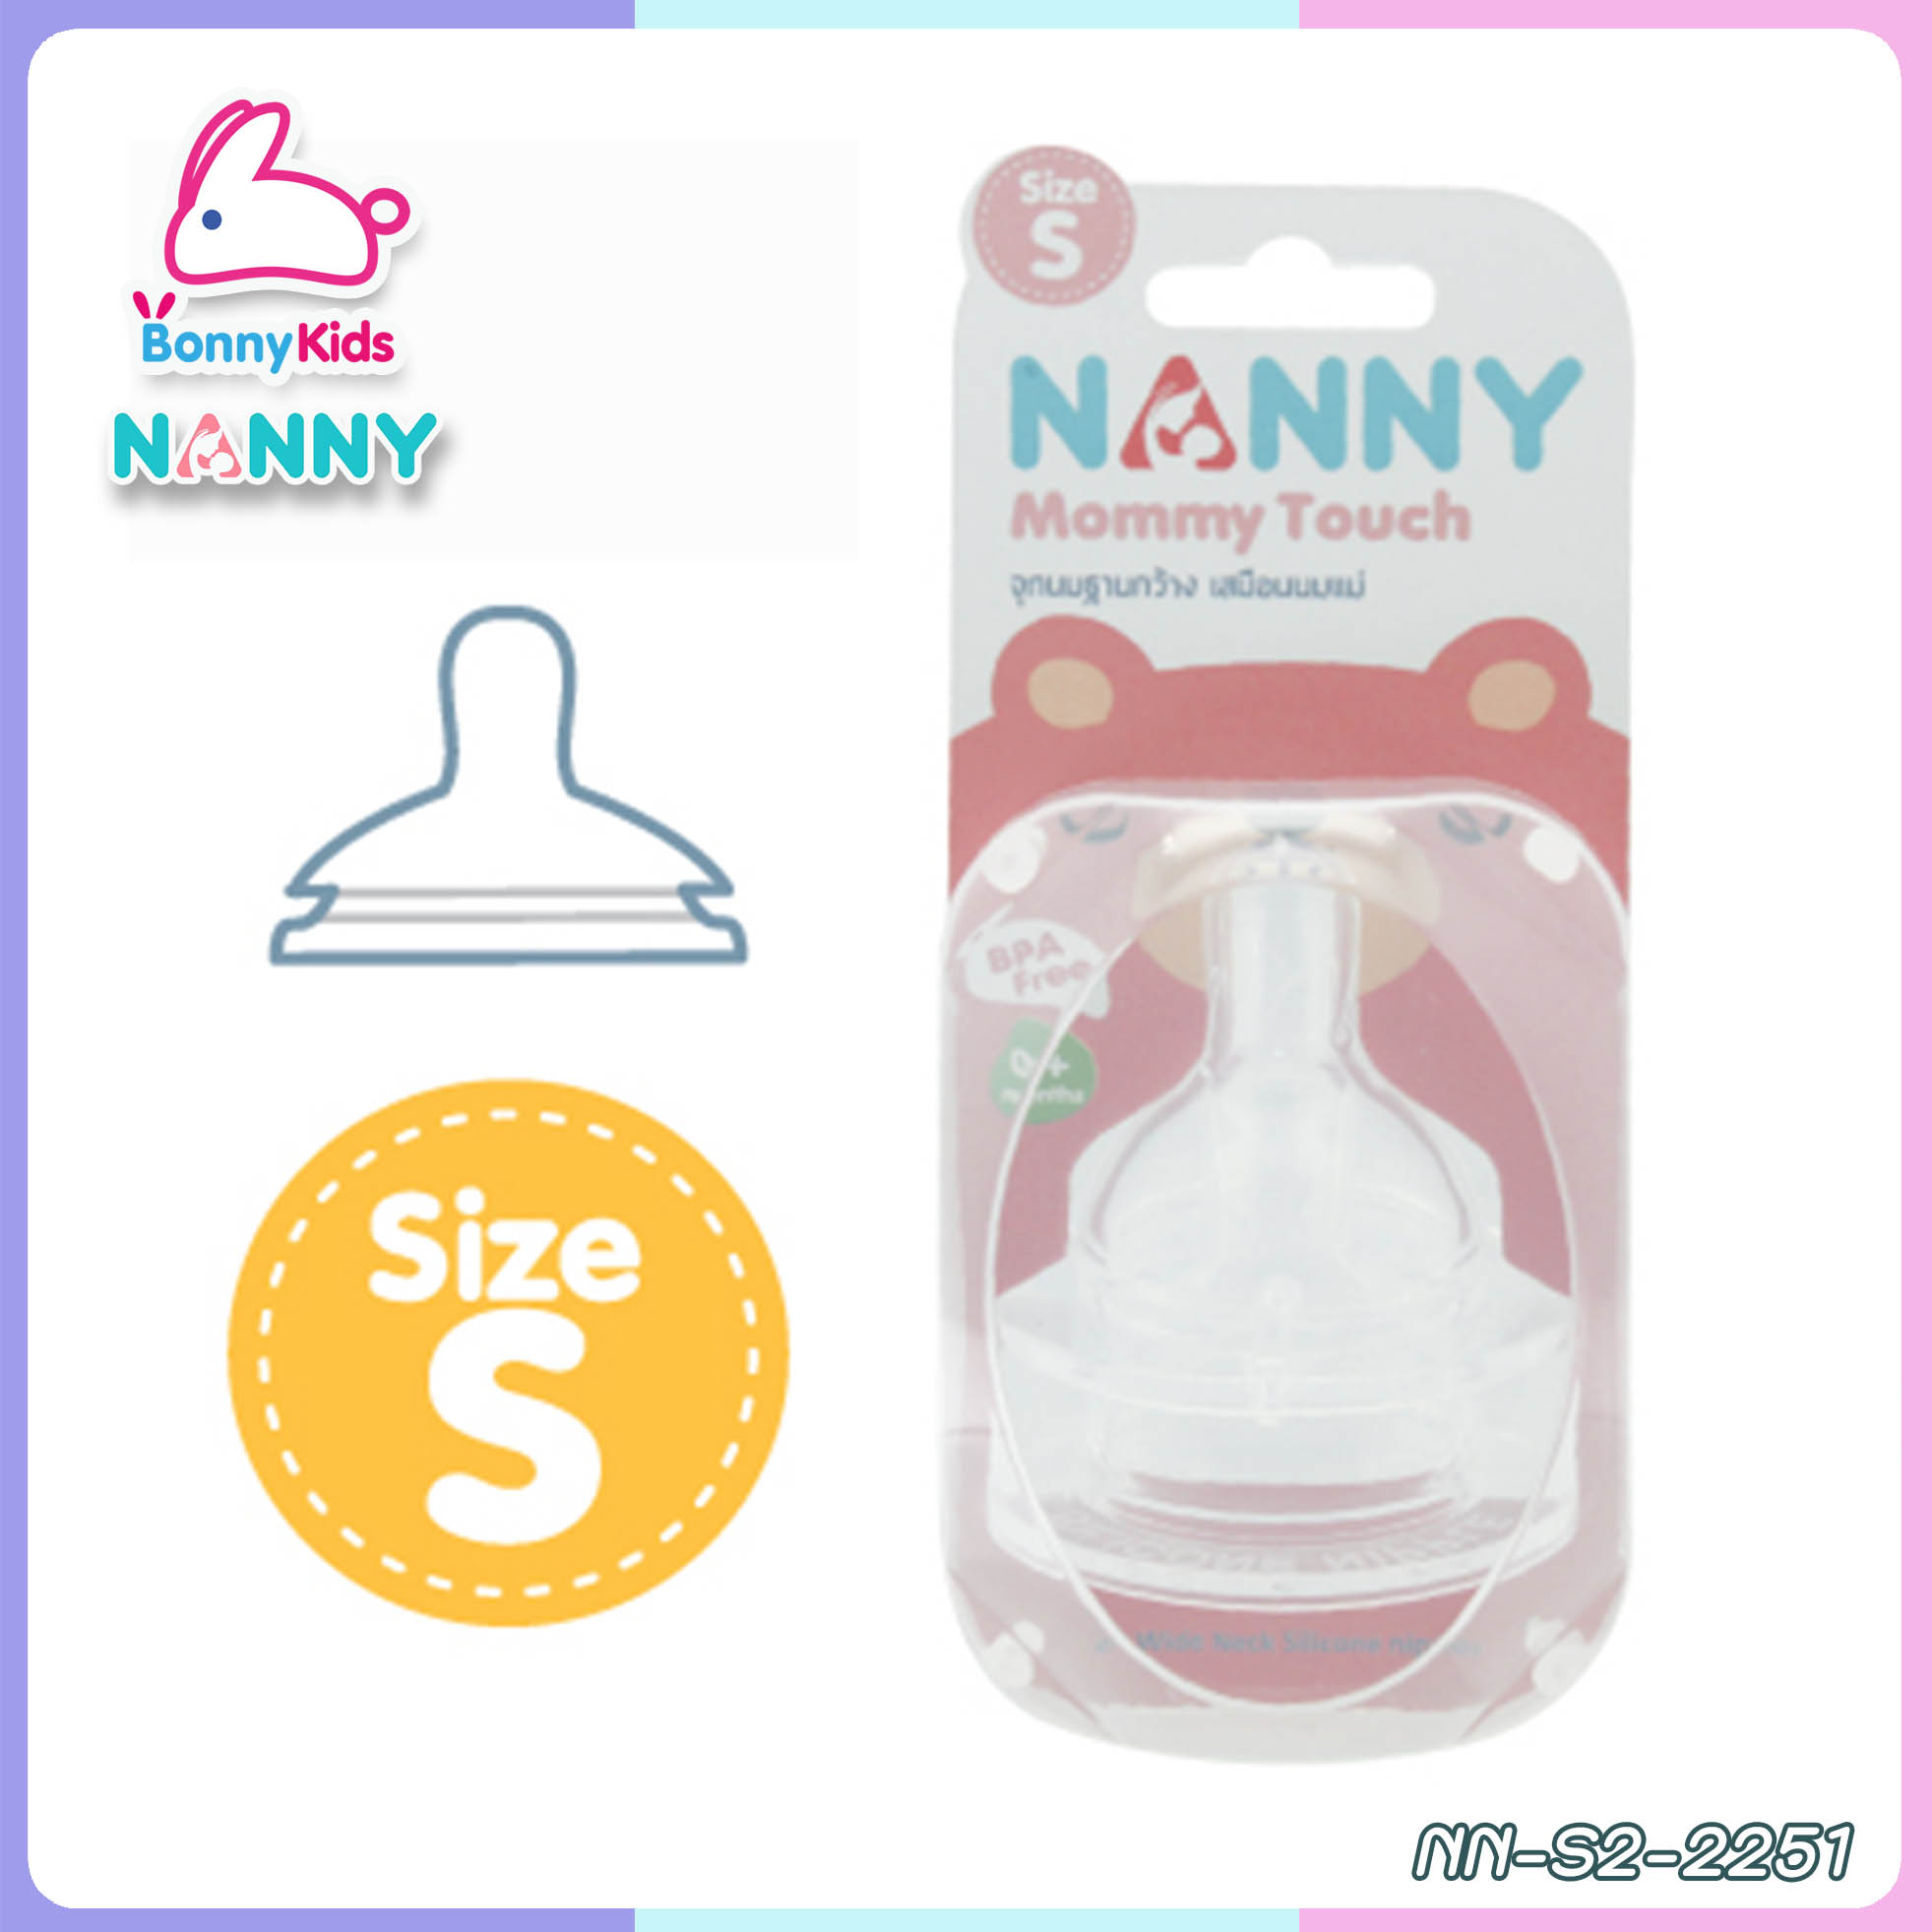 nanny แนนนี่จุกนมซิลิโคนปากกว้าง ไซส์ S แพ็ค2